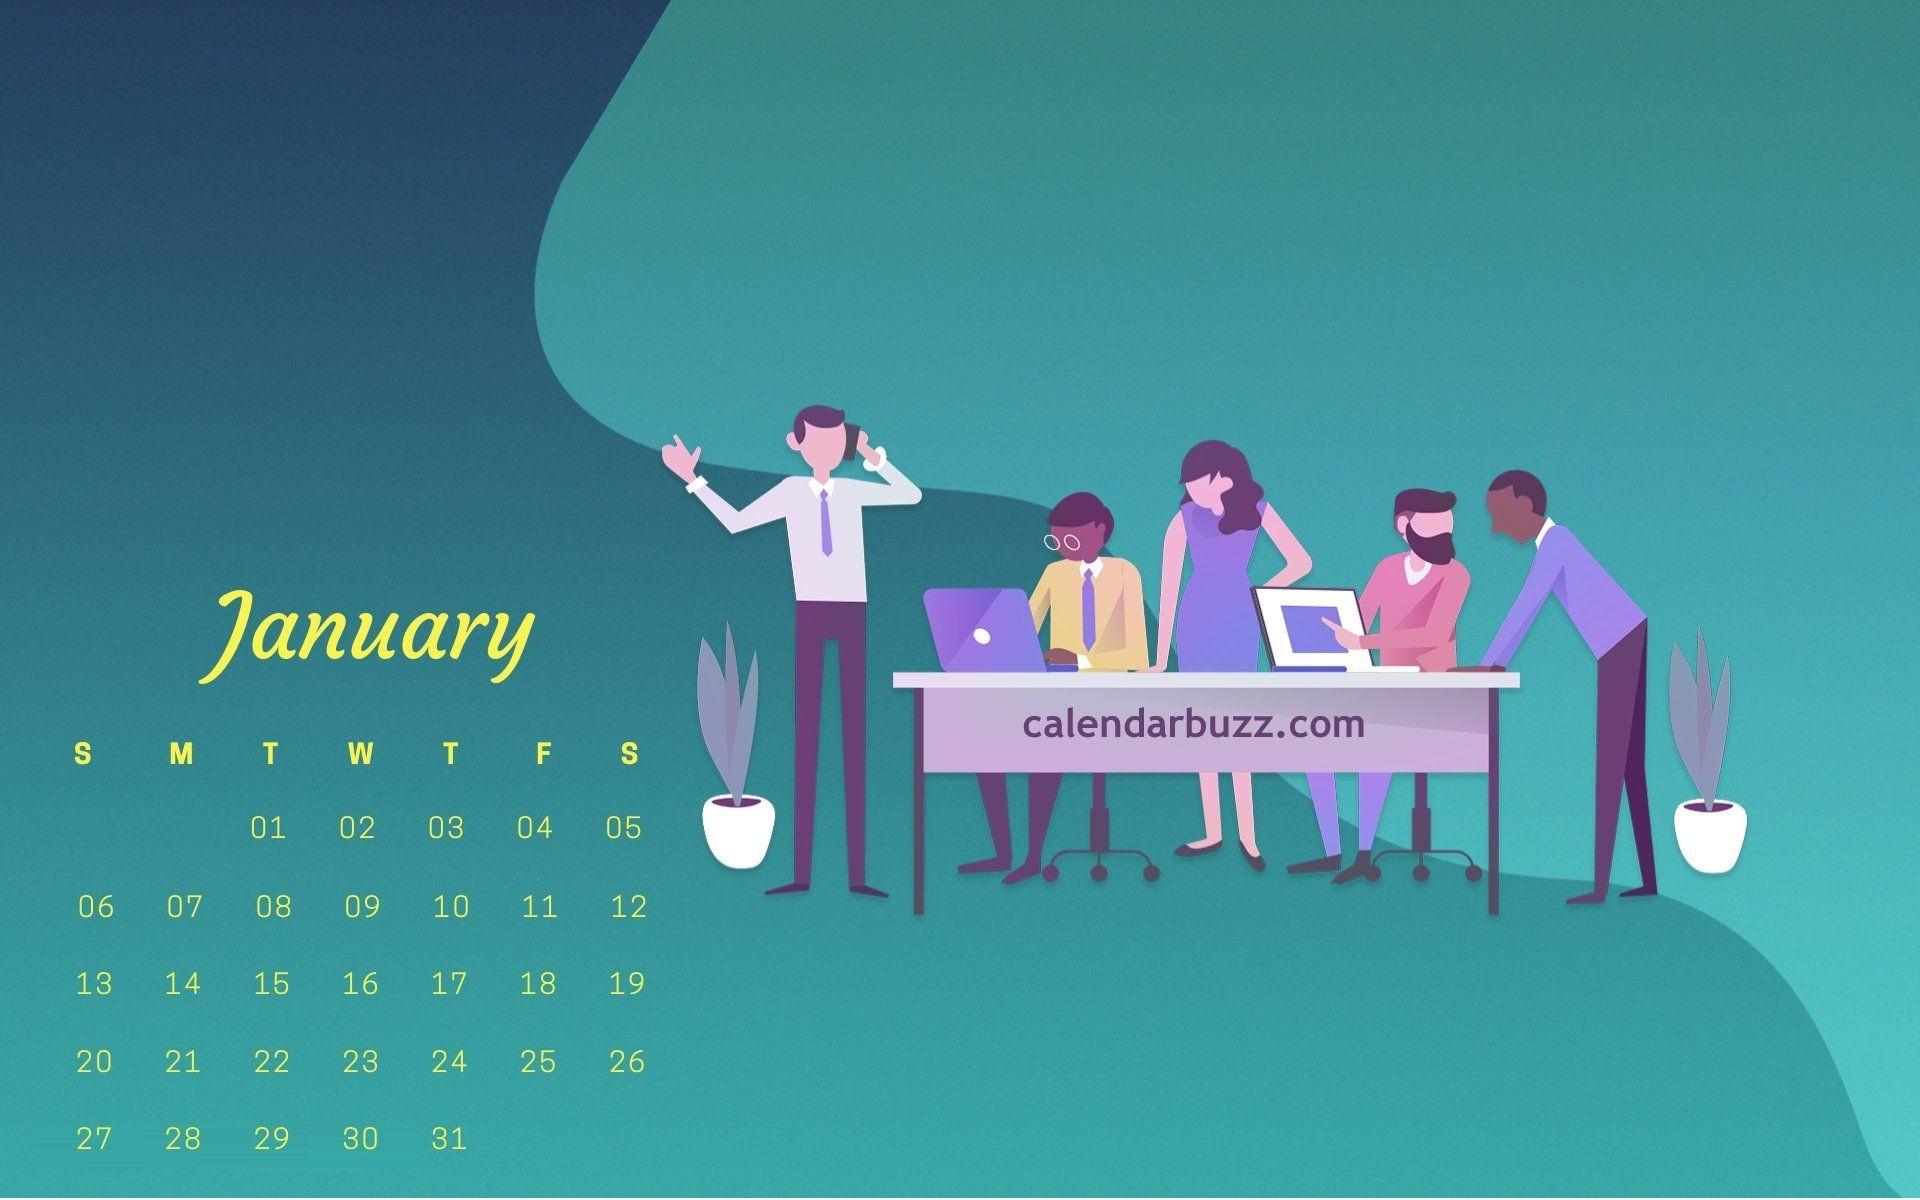 stylish january 2019 calendar wallpaper